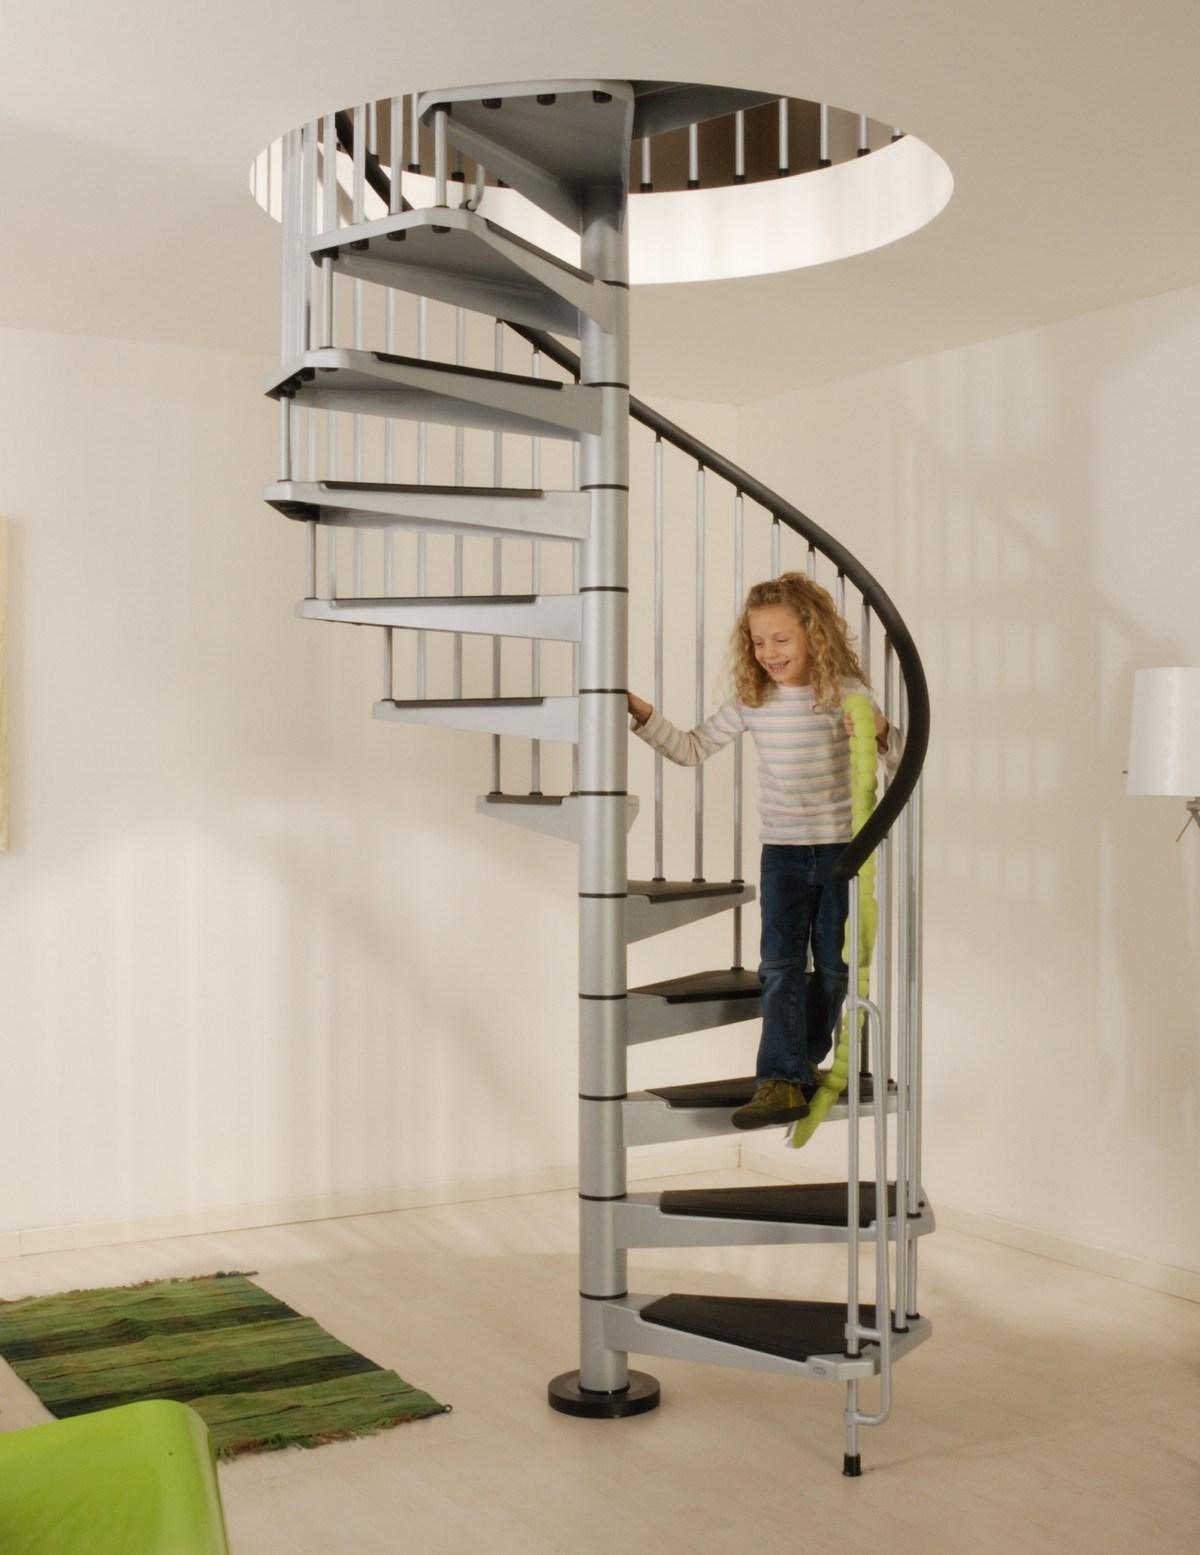 Civik Spiral Staircase Kit Metal Steel And Wood Spiral | 36 Inch Spiral Staircase | Stair Case | Steel | Steps | Tread Depth | Handrail